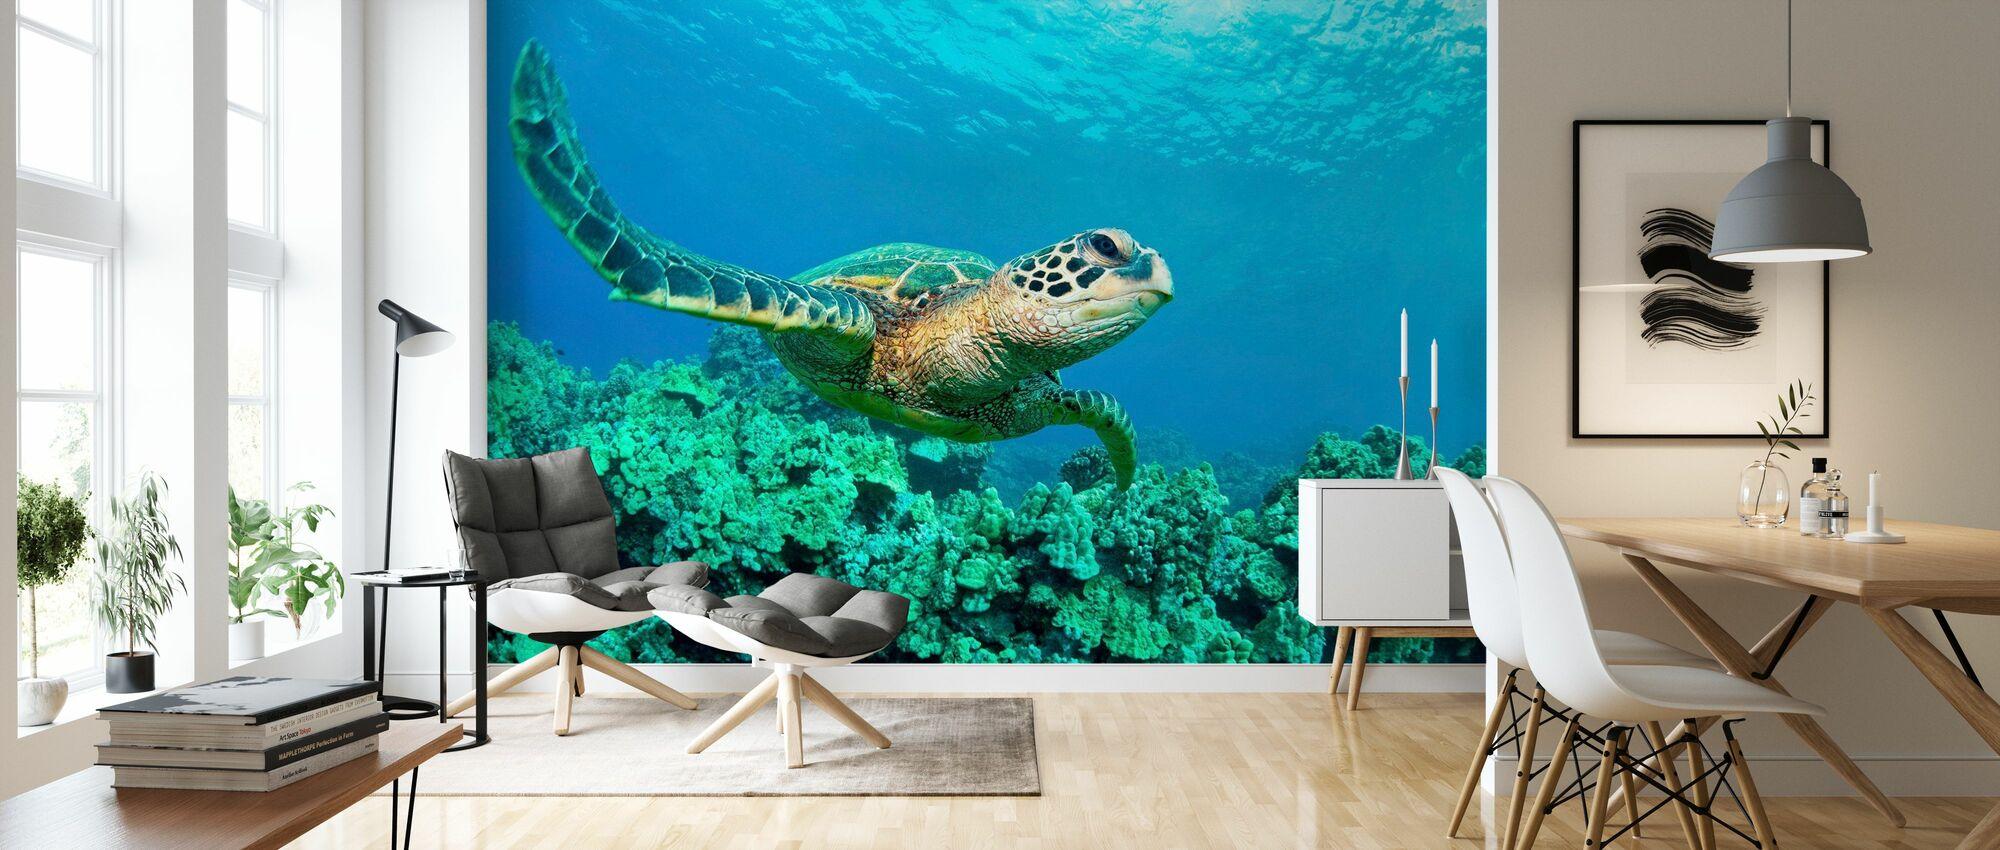 Sea Turtle in Coral - Wallpaper - Living Room